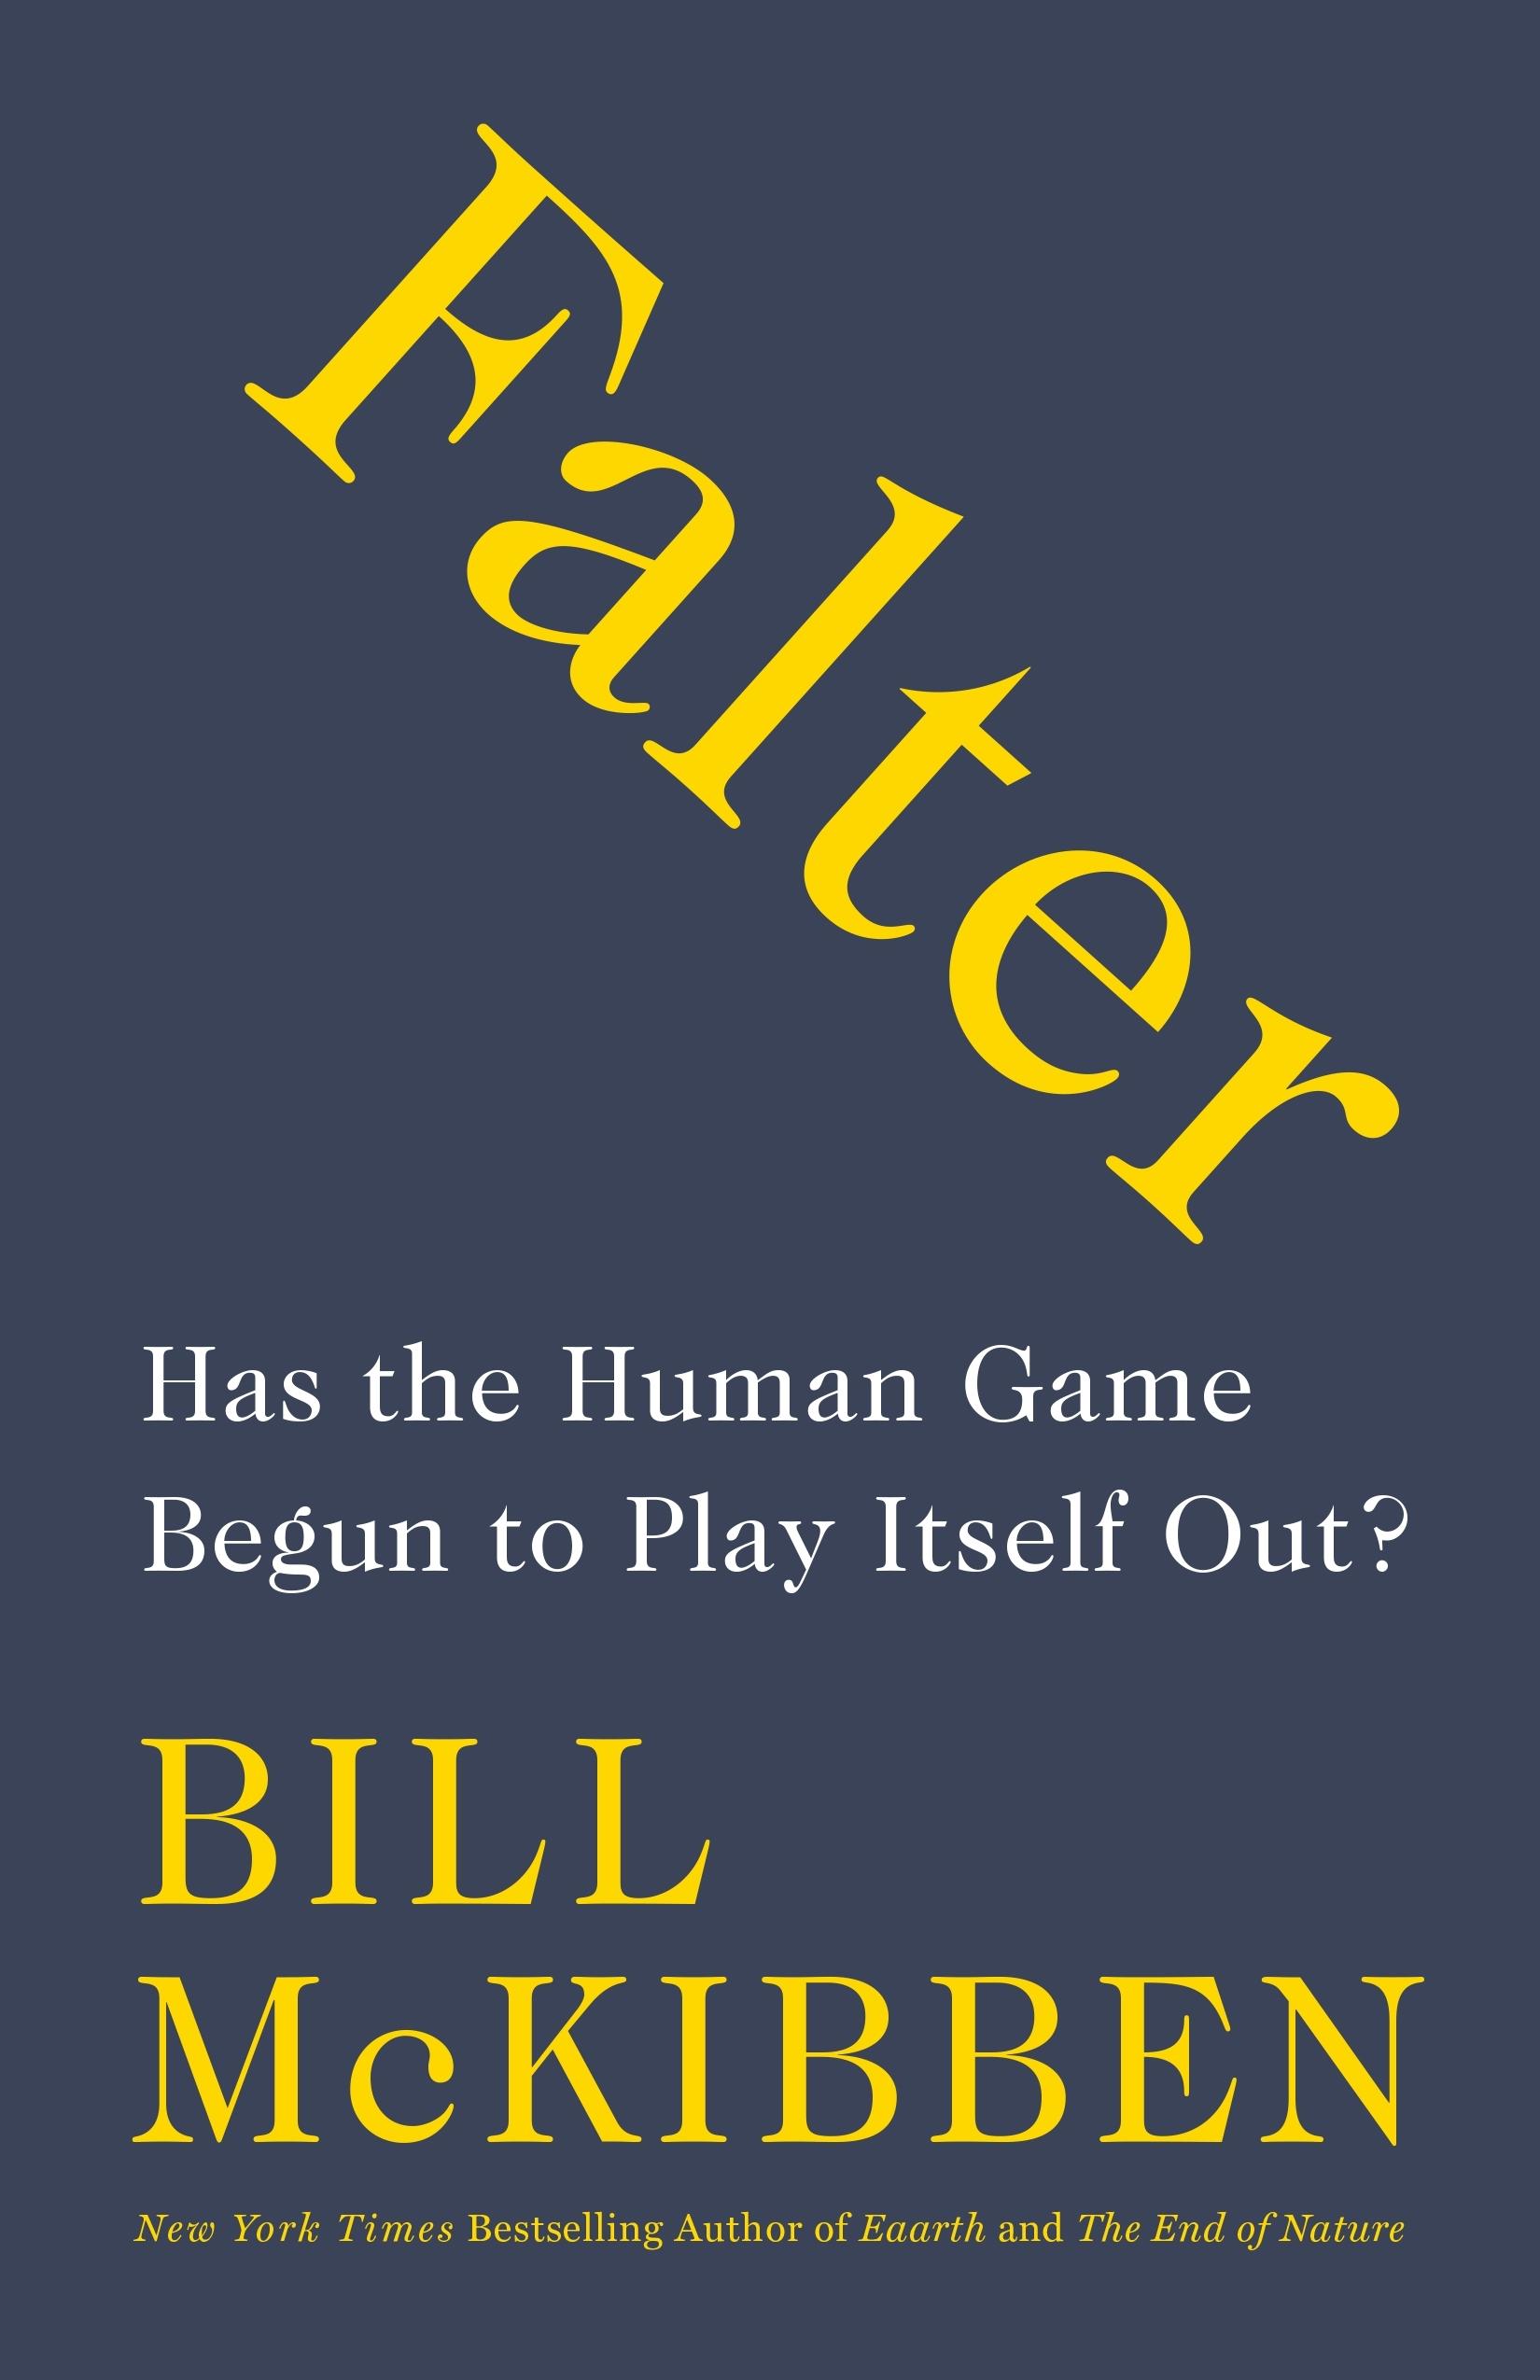 Bill McKibben Book 'Falter' Details Possibility of Human Extinction